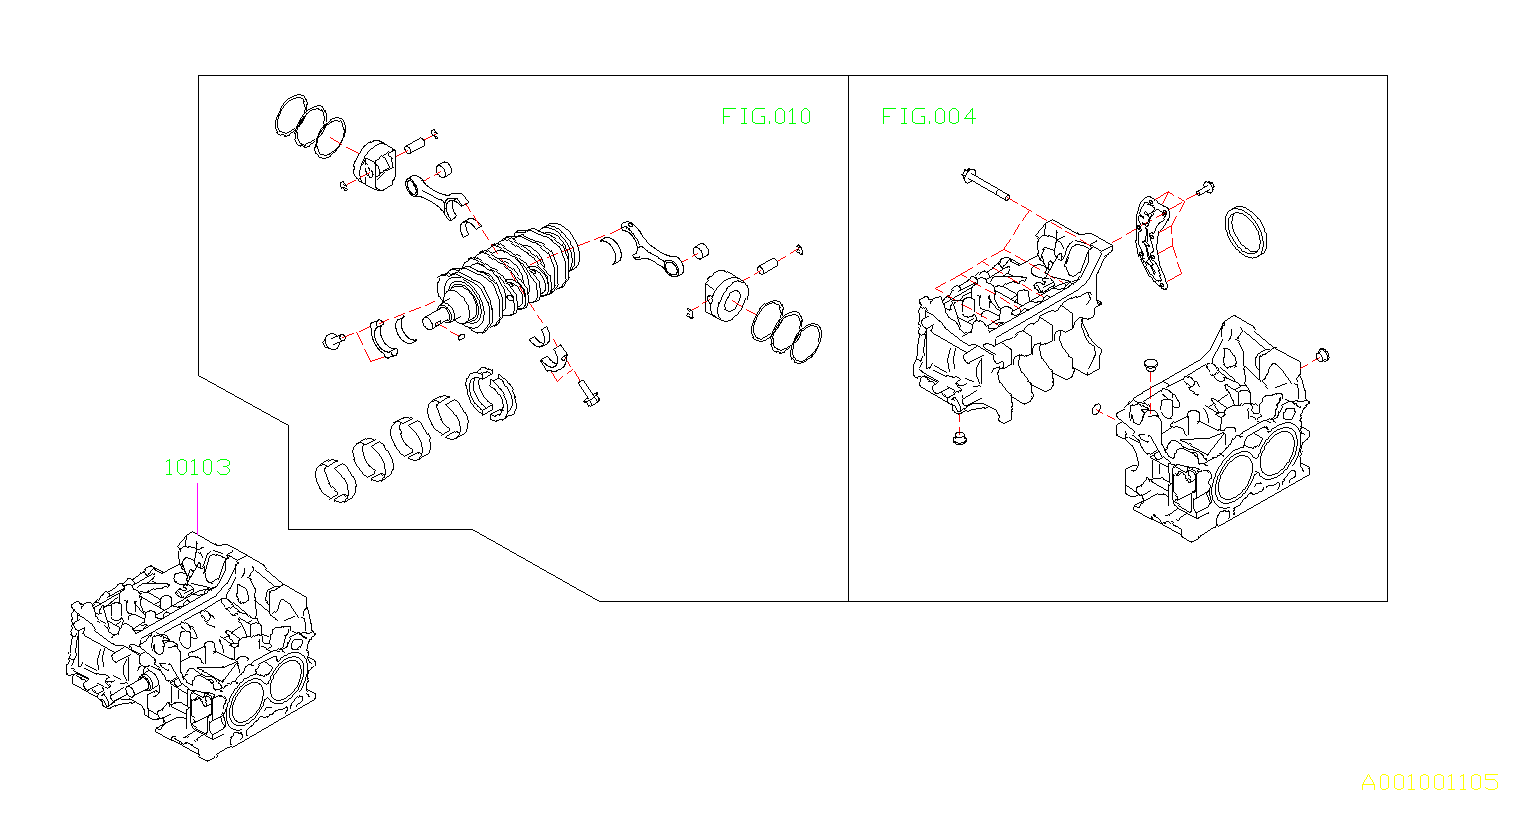 subaru brz short block engine assembly